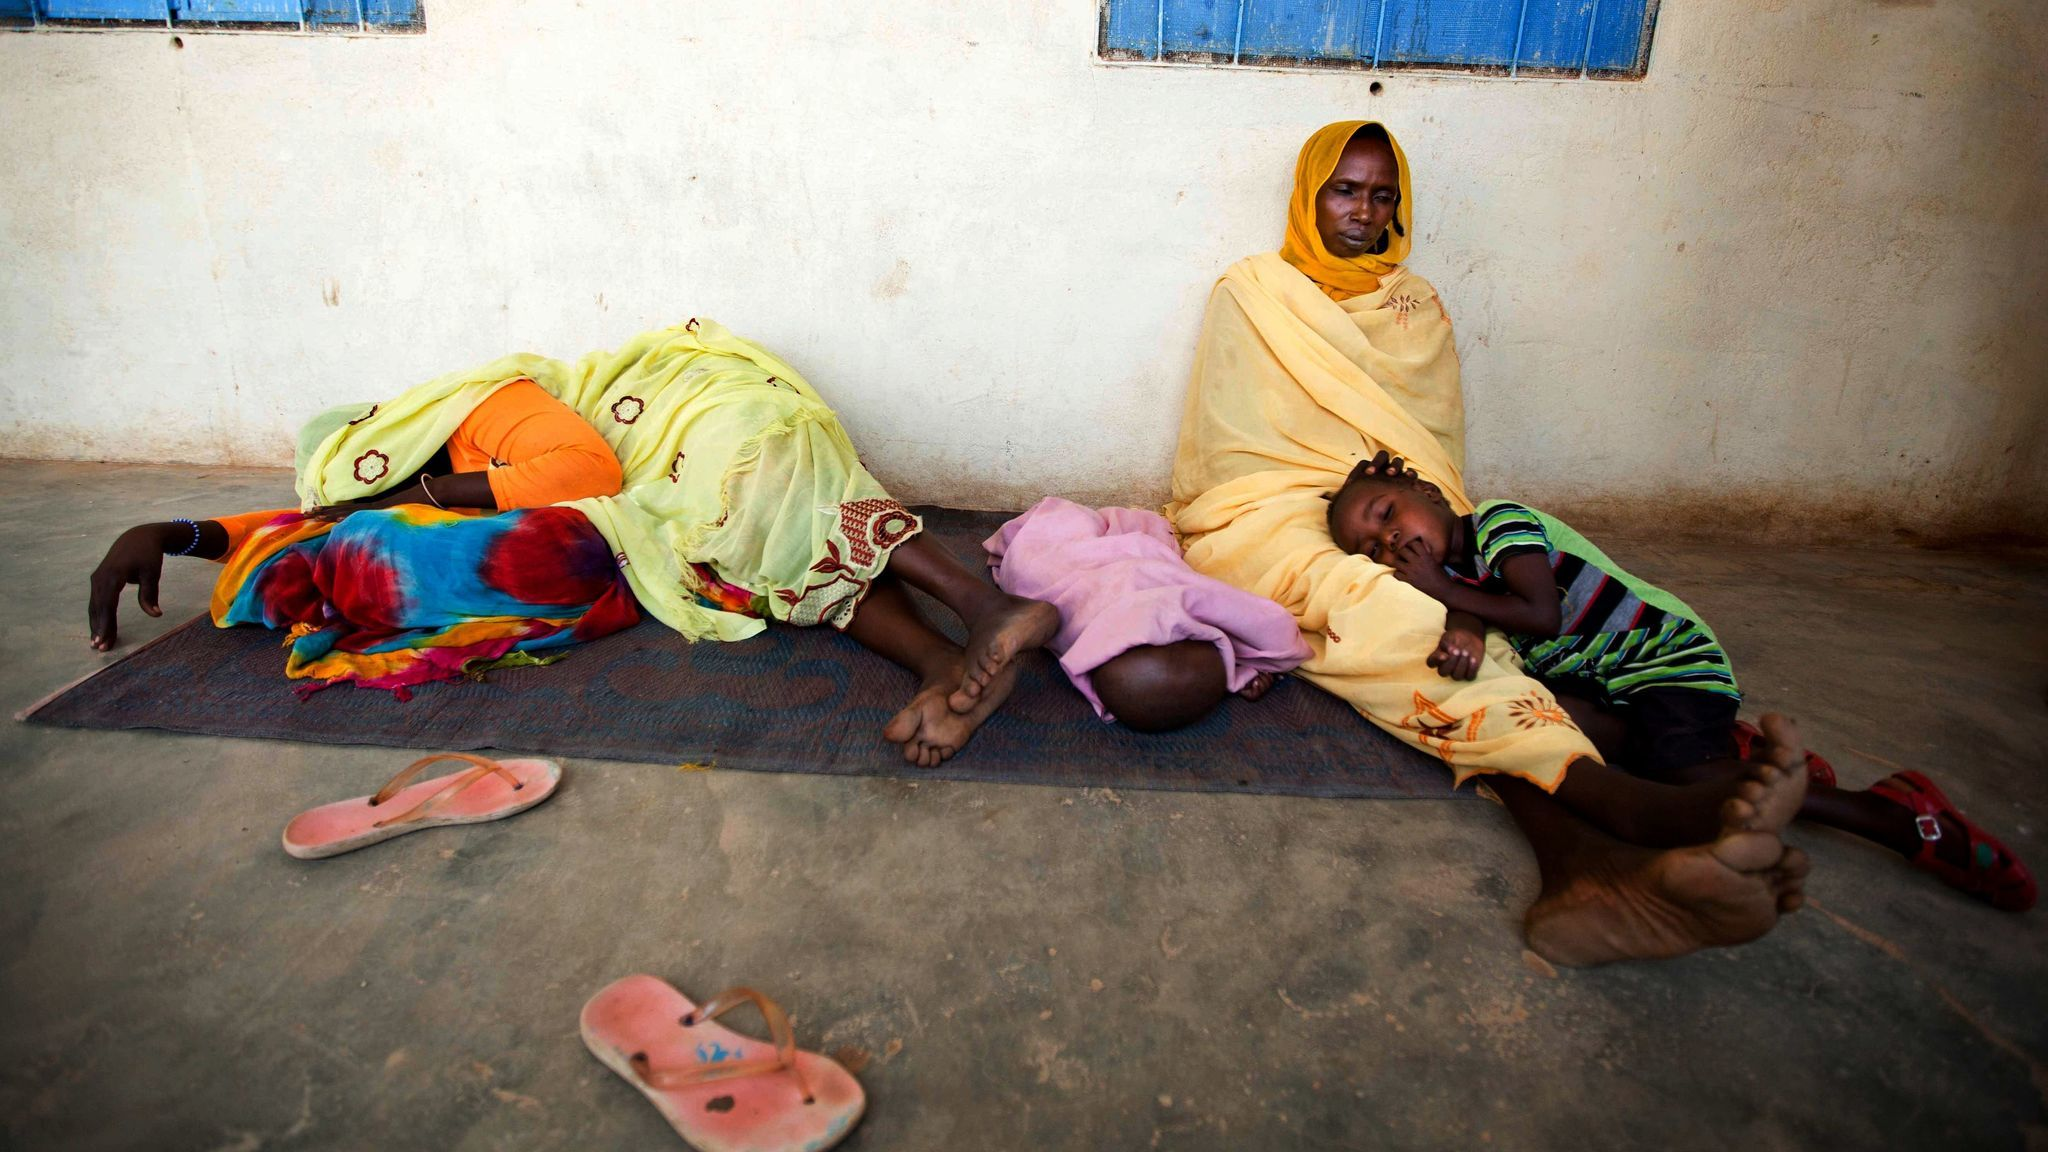 Women & children waiting for treatment in North Darfur, Sudan.